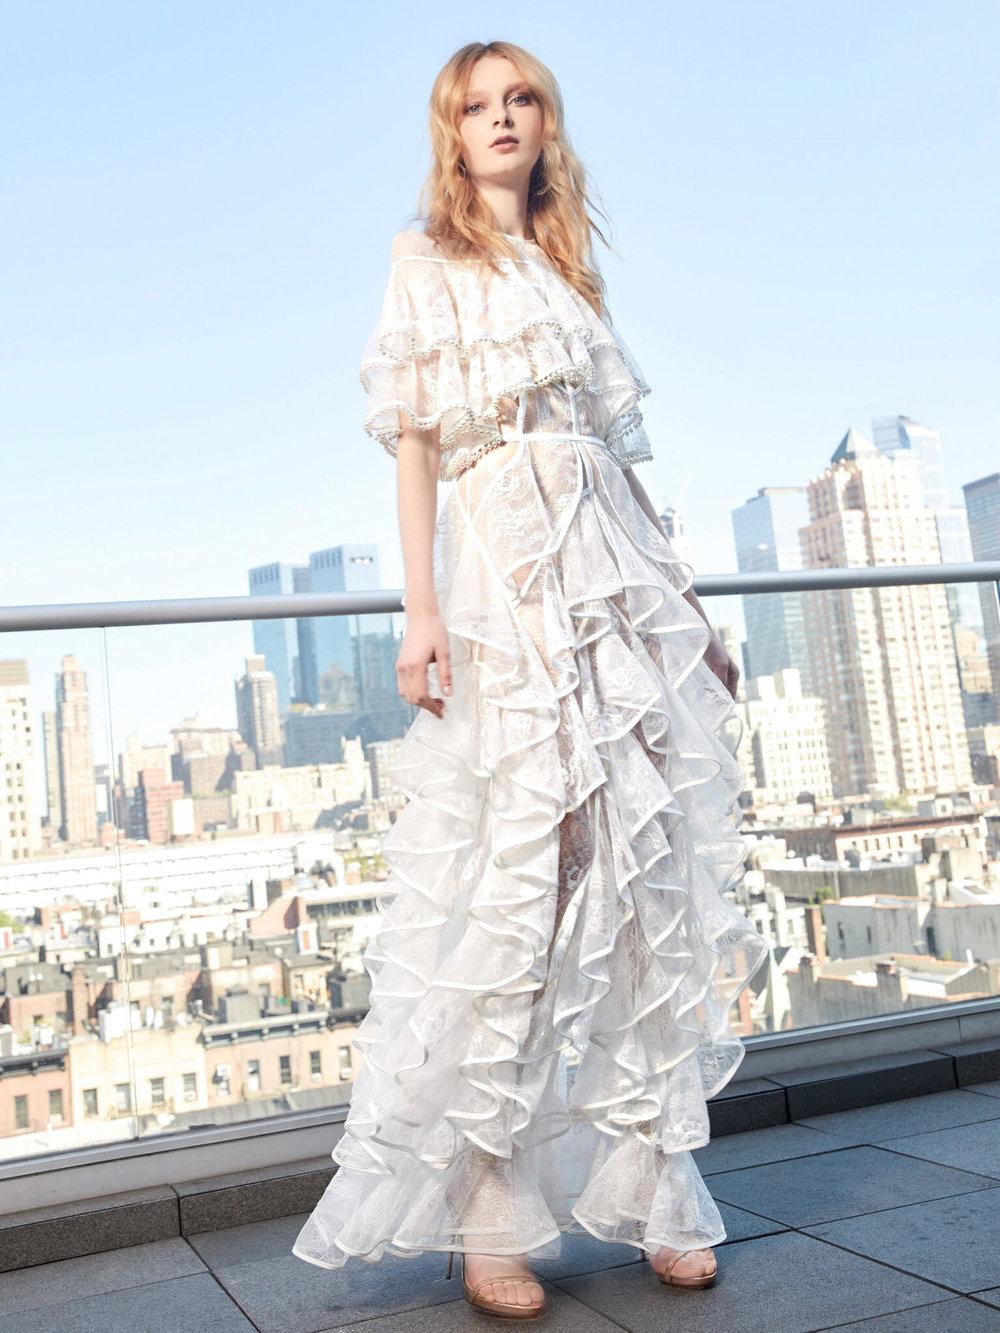 Season: Fall 2017    Gown name: Alberta 圆领领口合身剪裁的婚纱礼服    Description: 圆领领口合身剪裁的婚纱礼服,由肩膊至裙摆由层层波浪状蕾丝薄纱交织, 每一层纱都缝上颗颗水滴状珍珠流苏,非常活泼美丽。新娘子穿上后舞动更见活泼,不但 适用于宴会中的舞蹈环节,与海滩婚礼亦是绝佳组合。